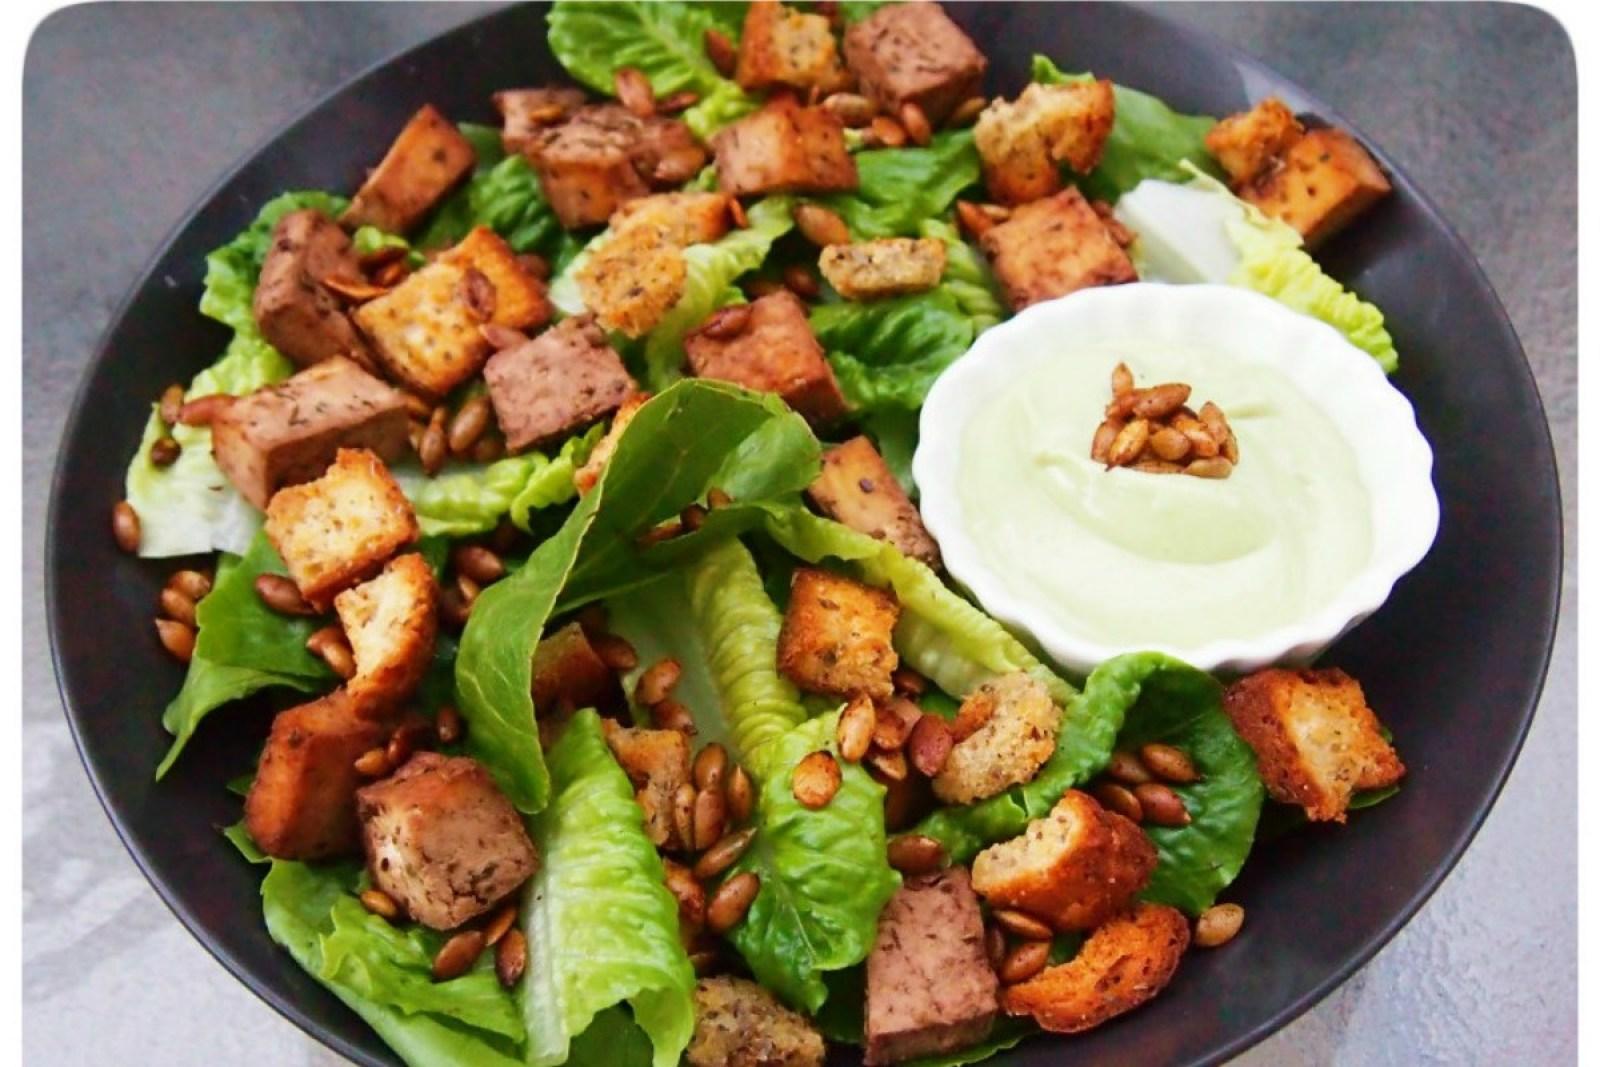 Herb Tofu Caesar Salad With Spicy Pepitas [Vegan, Gluten-Free]